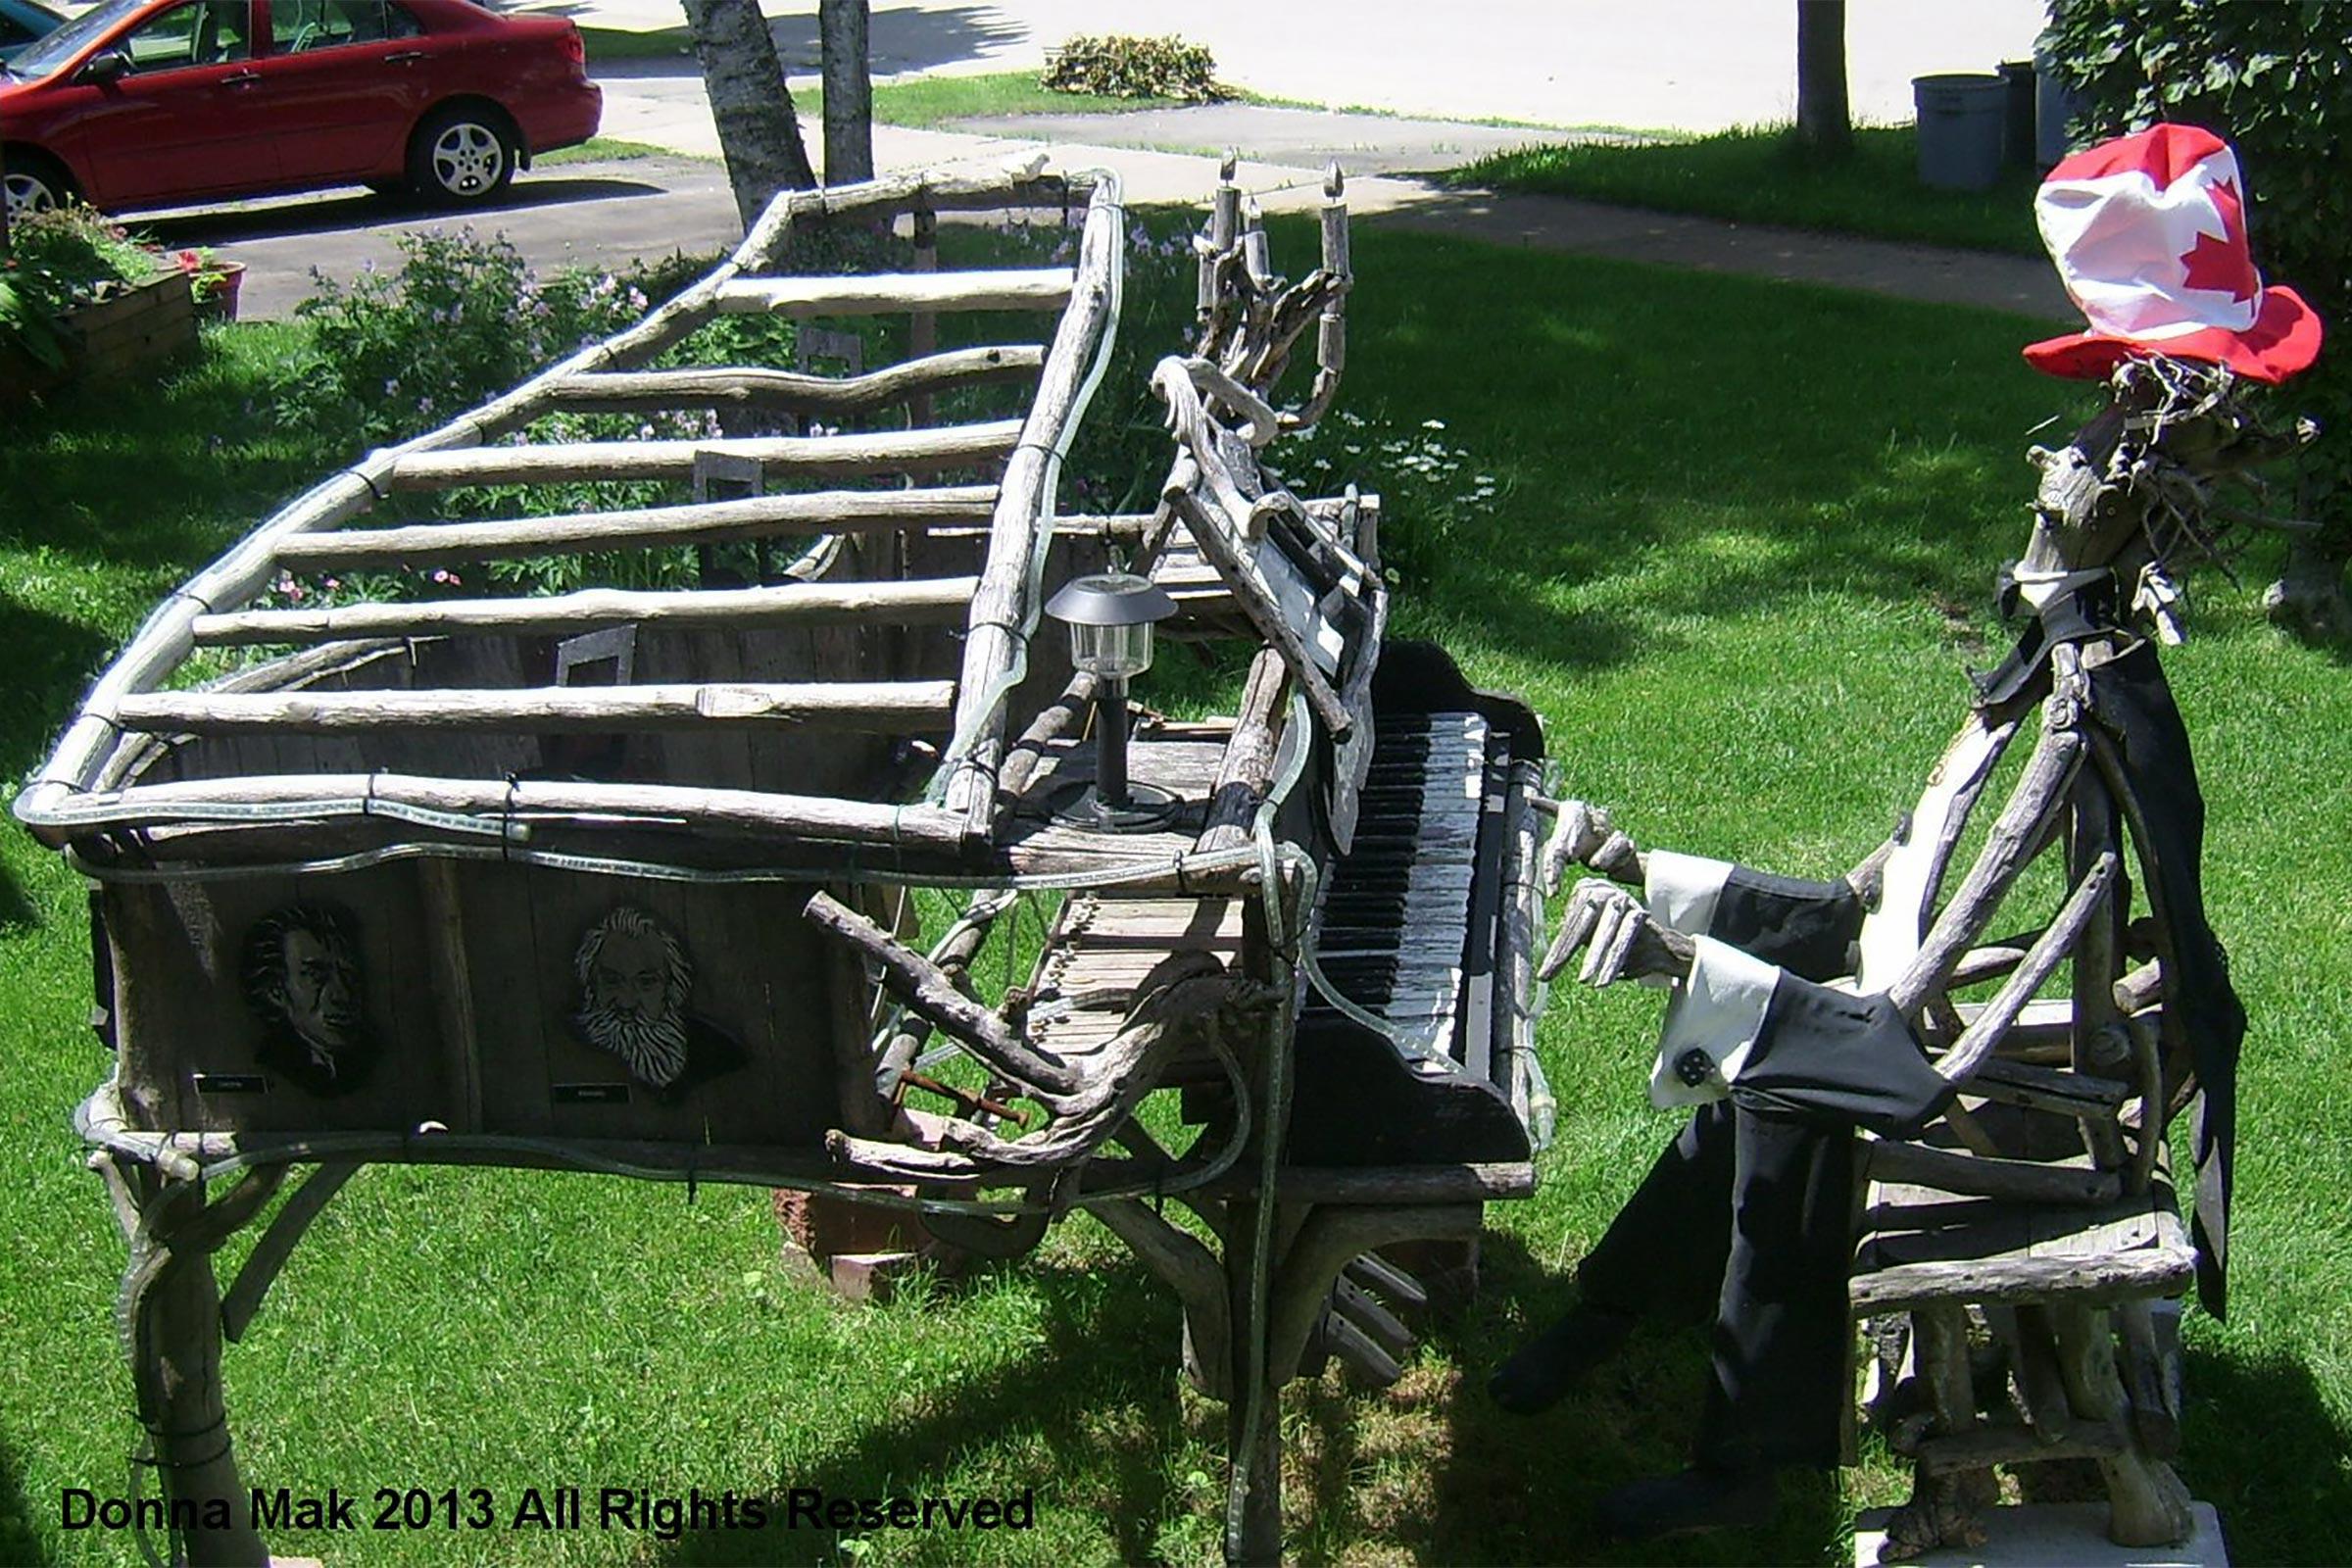 Outdoor Driftwood Sculpture at Donna Mak Piano Studio